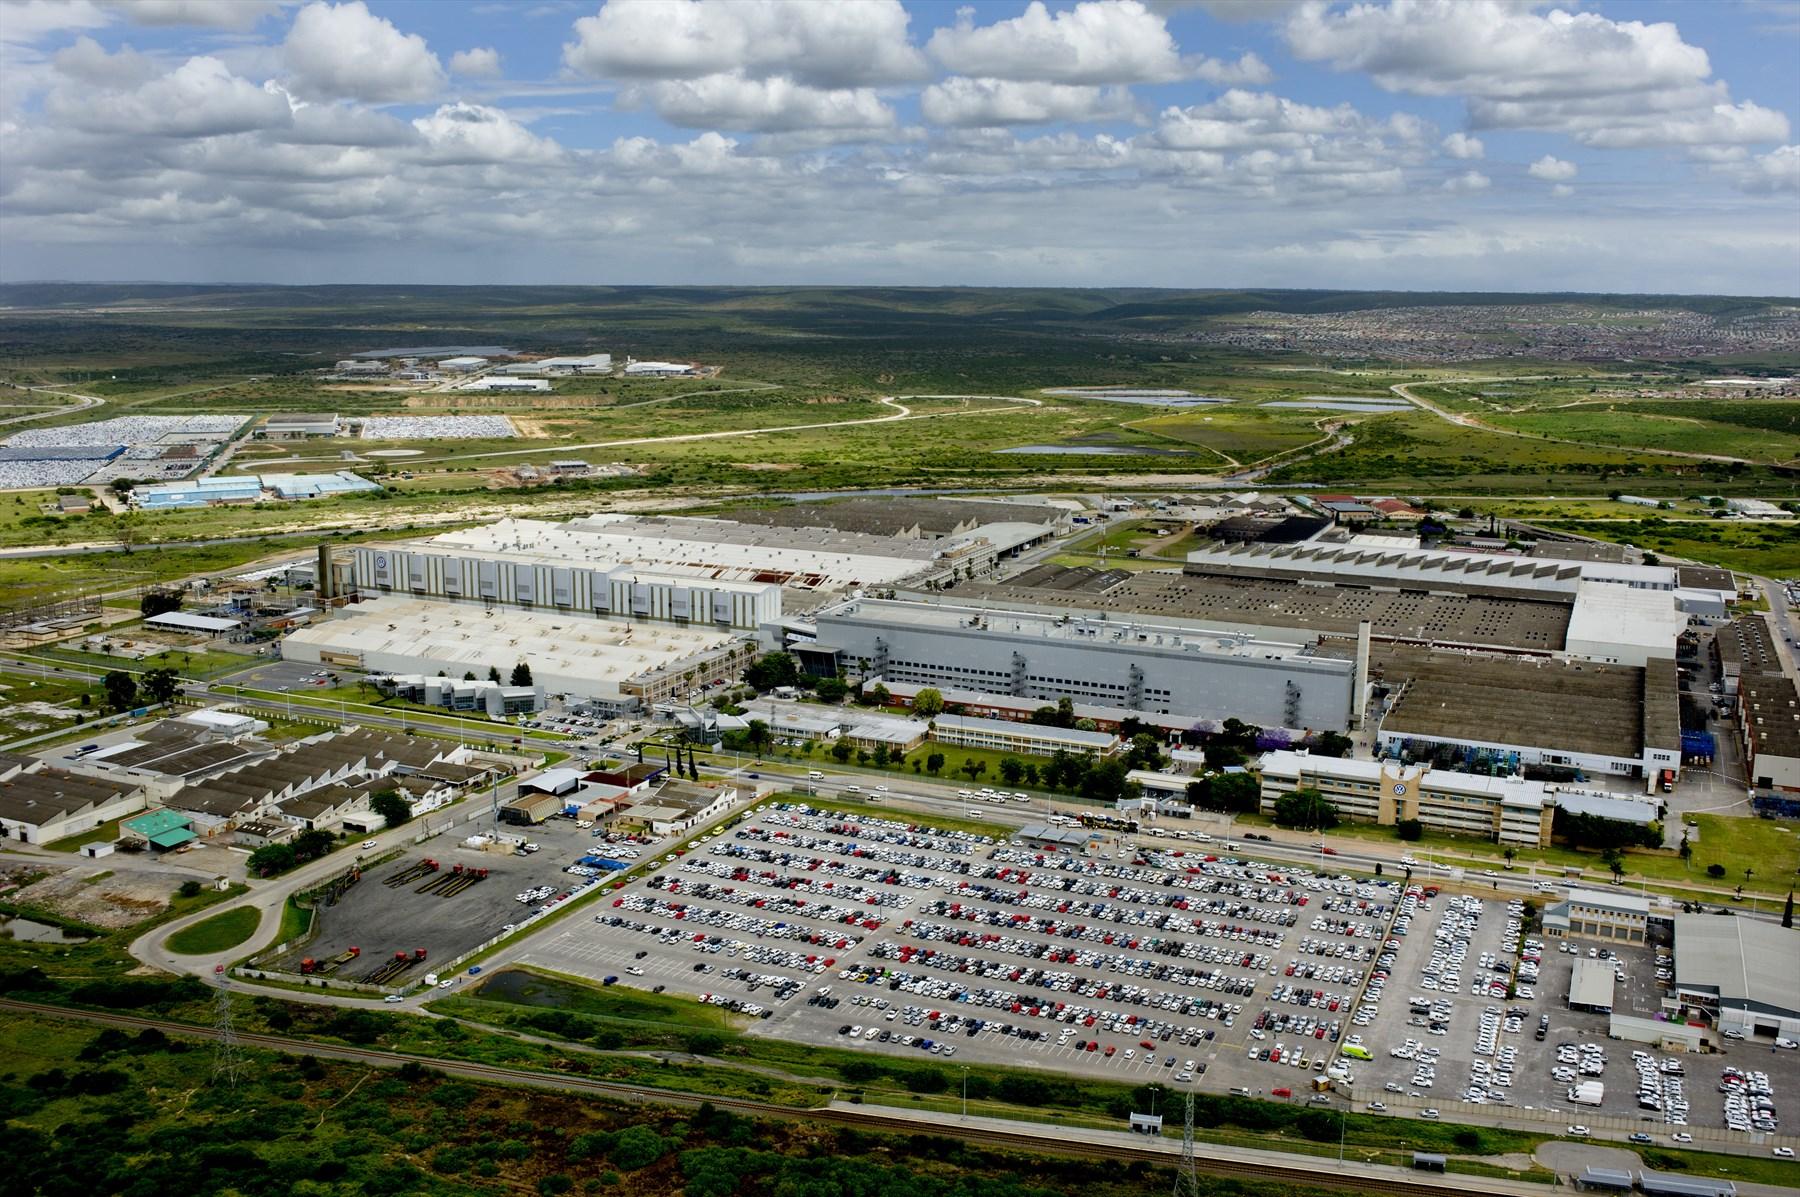 vwsa-manufacturing-plant-uitenhage_1800x1800